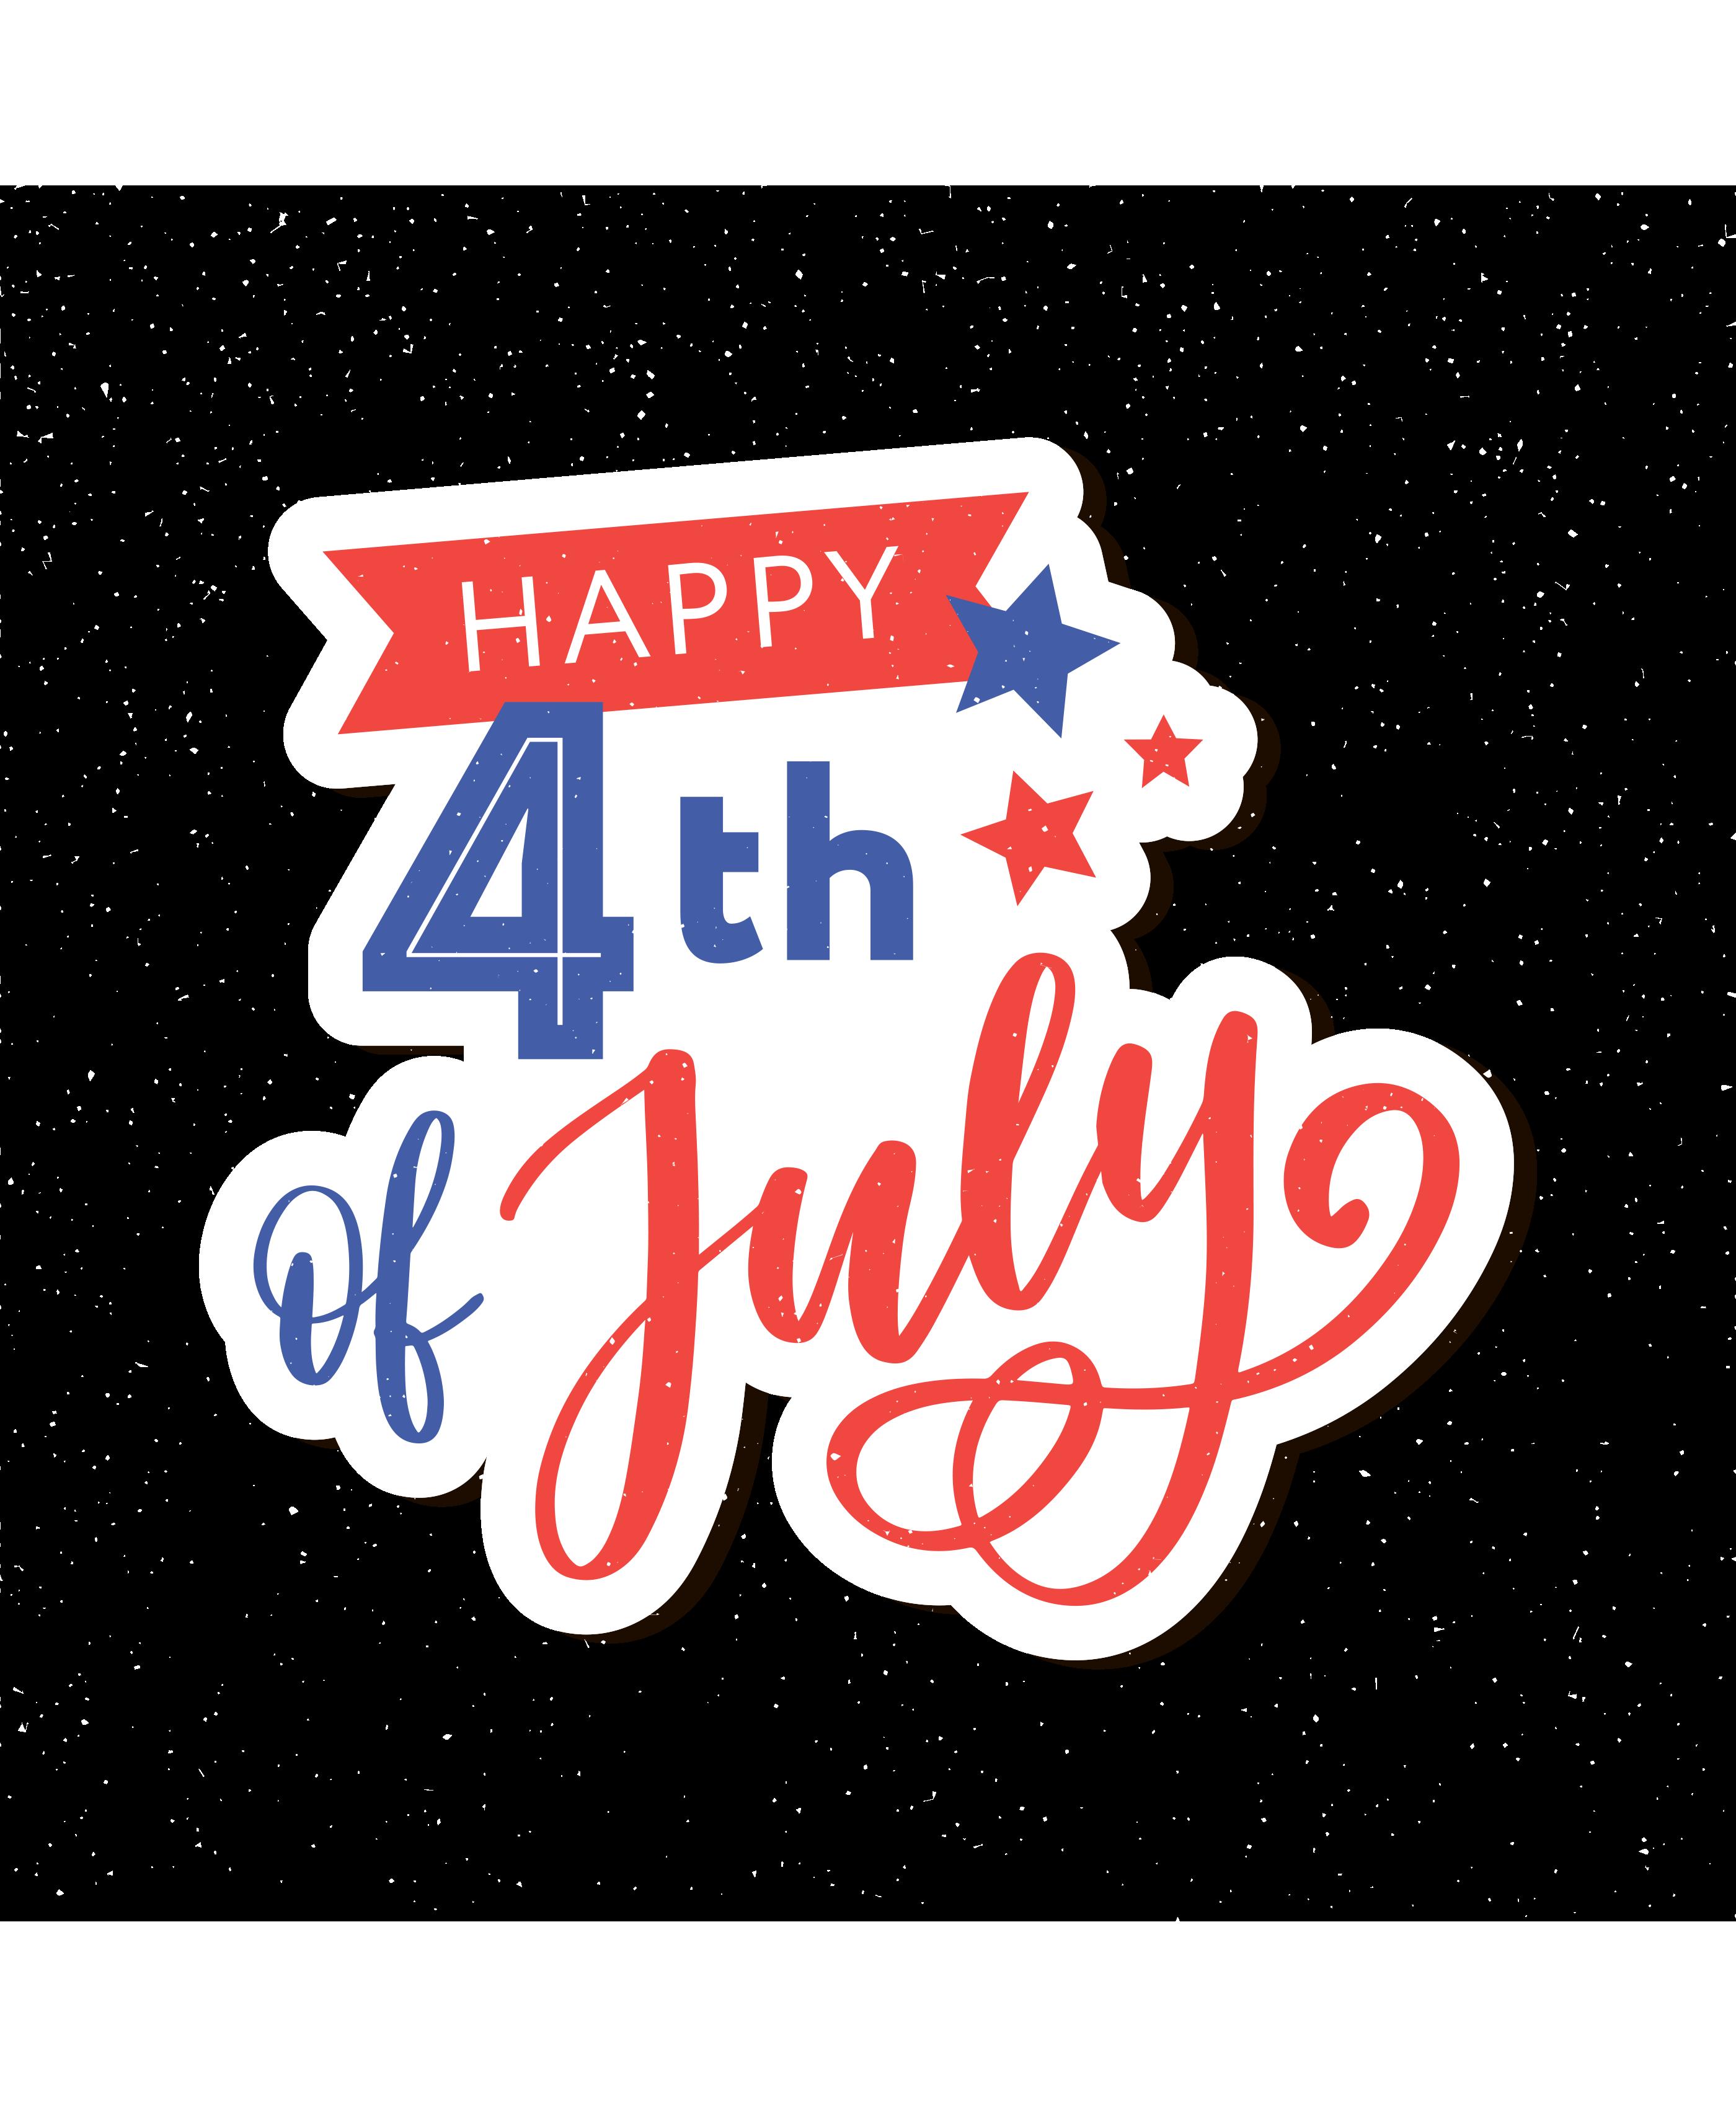 Happy 4th Of July Happy 4 Of July 4th Of July Happy